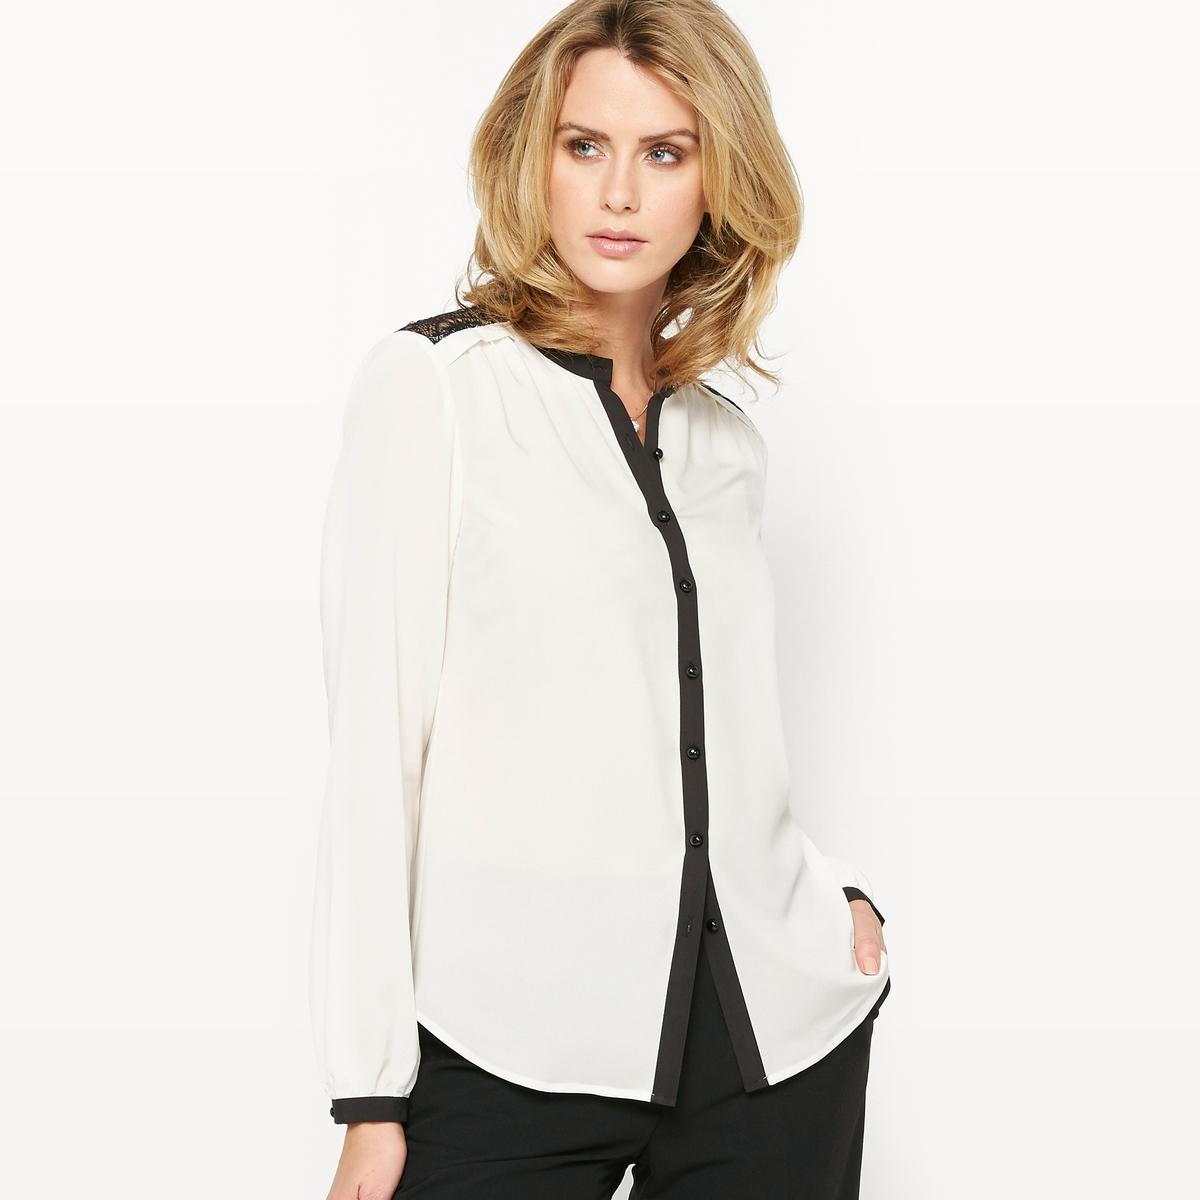 Блузка с кружевными вставками от ANNE WEYBURN